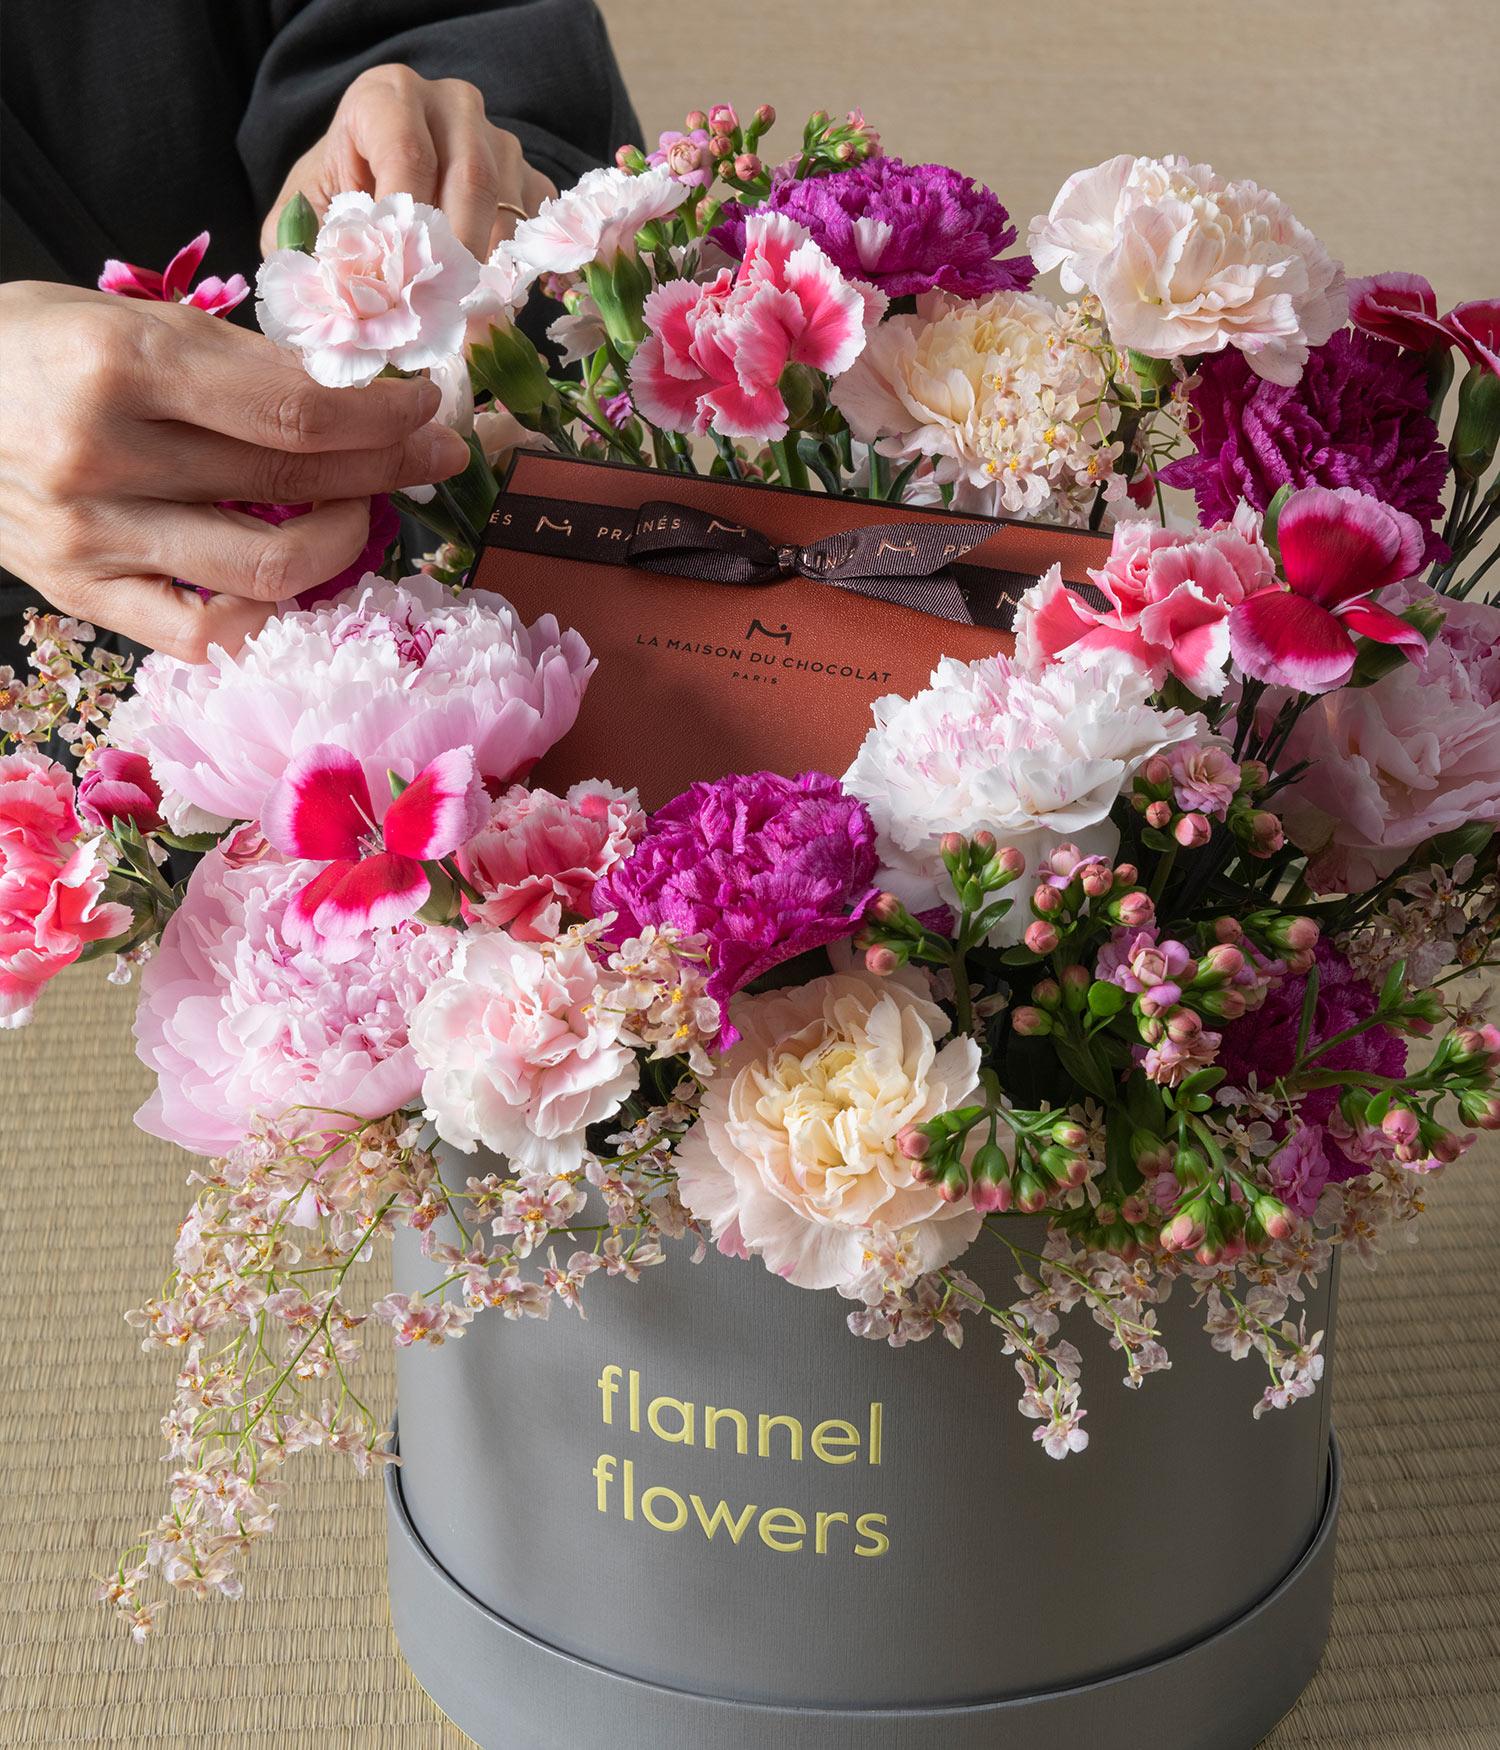 Florist arranging blossom II peony flower box by flannel flowers